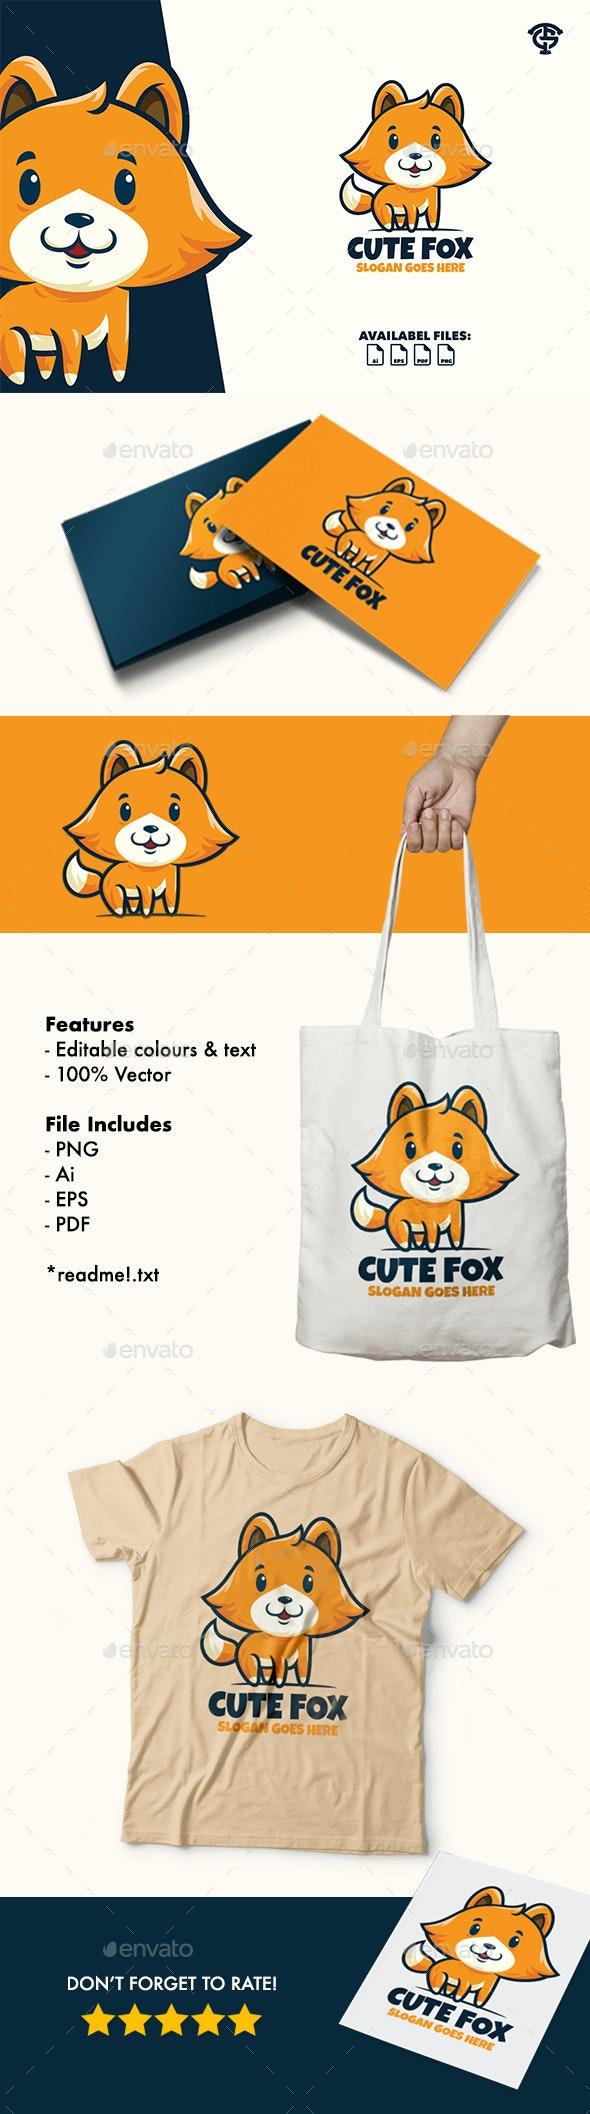 Cute Fox - Logo Mascot - Animals Logo Templates